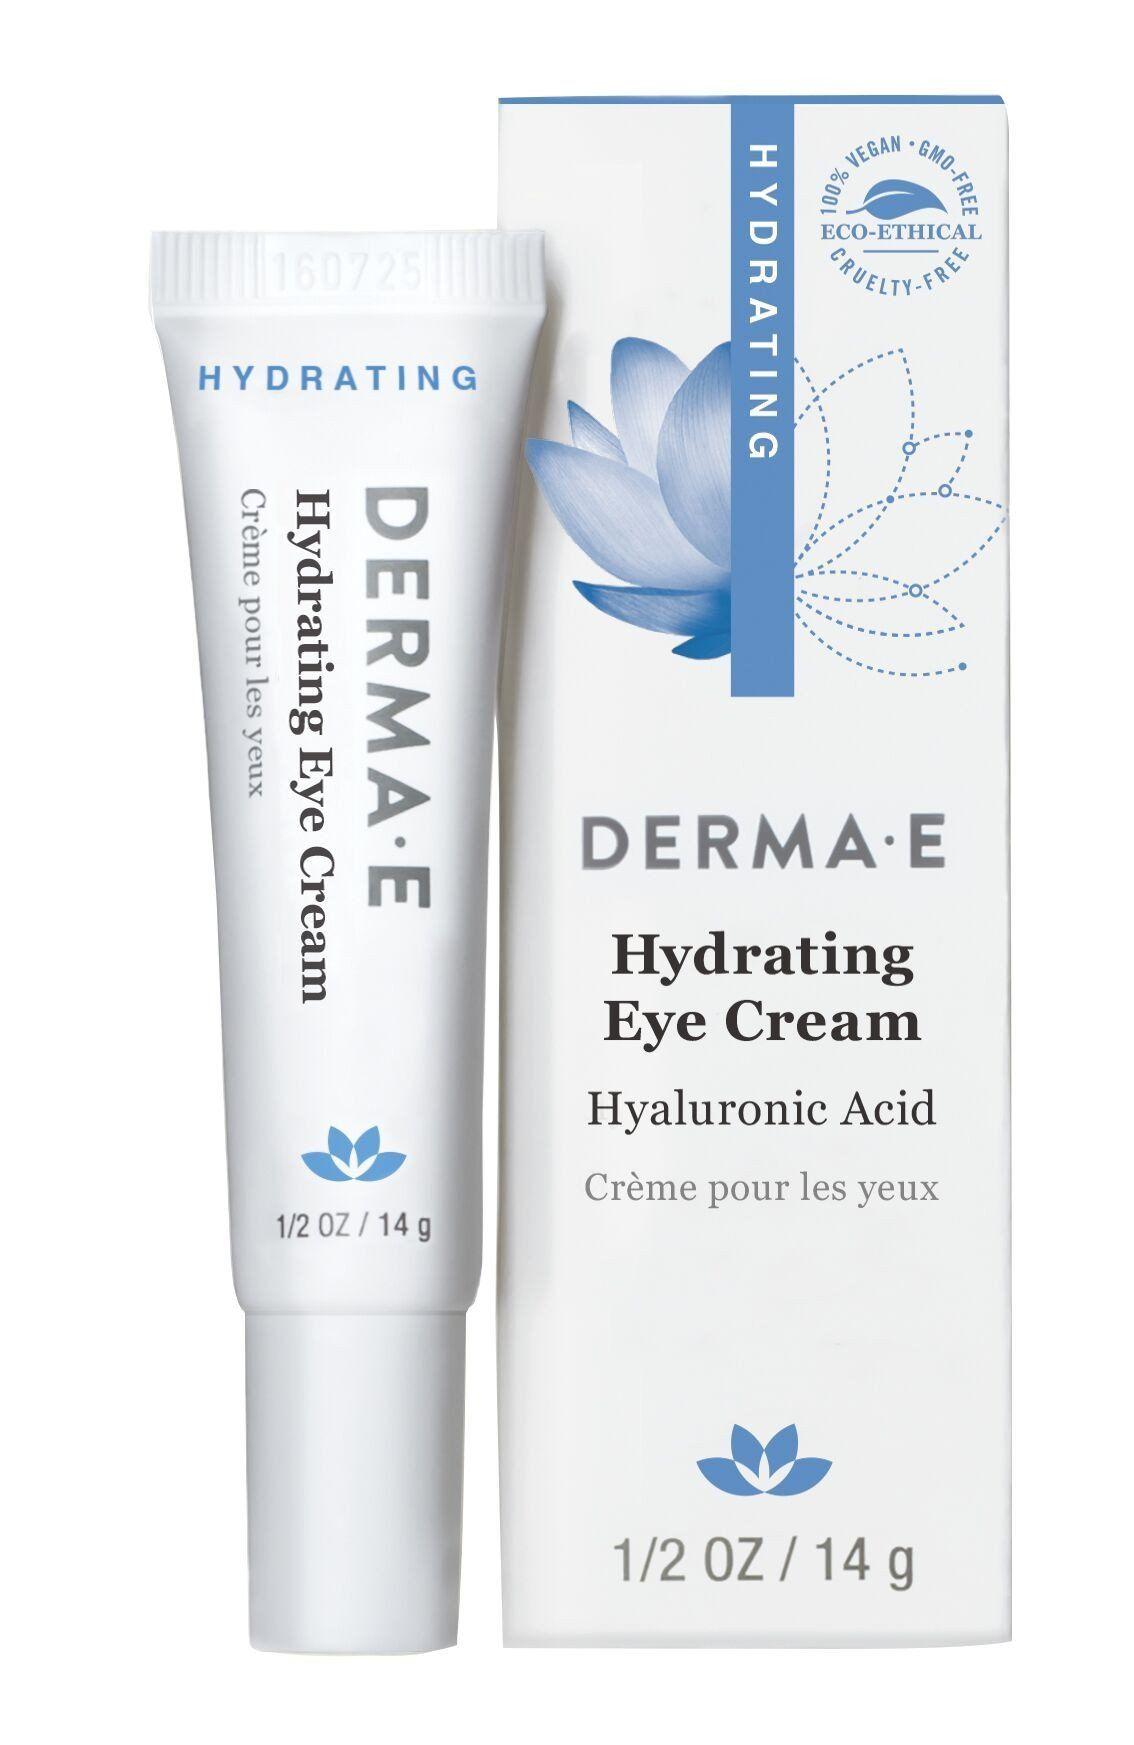 Shop Derma E Products Online At Image Beauty 10 25 Hydrating Eye Cream Eye Cream Eye Creme